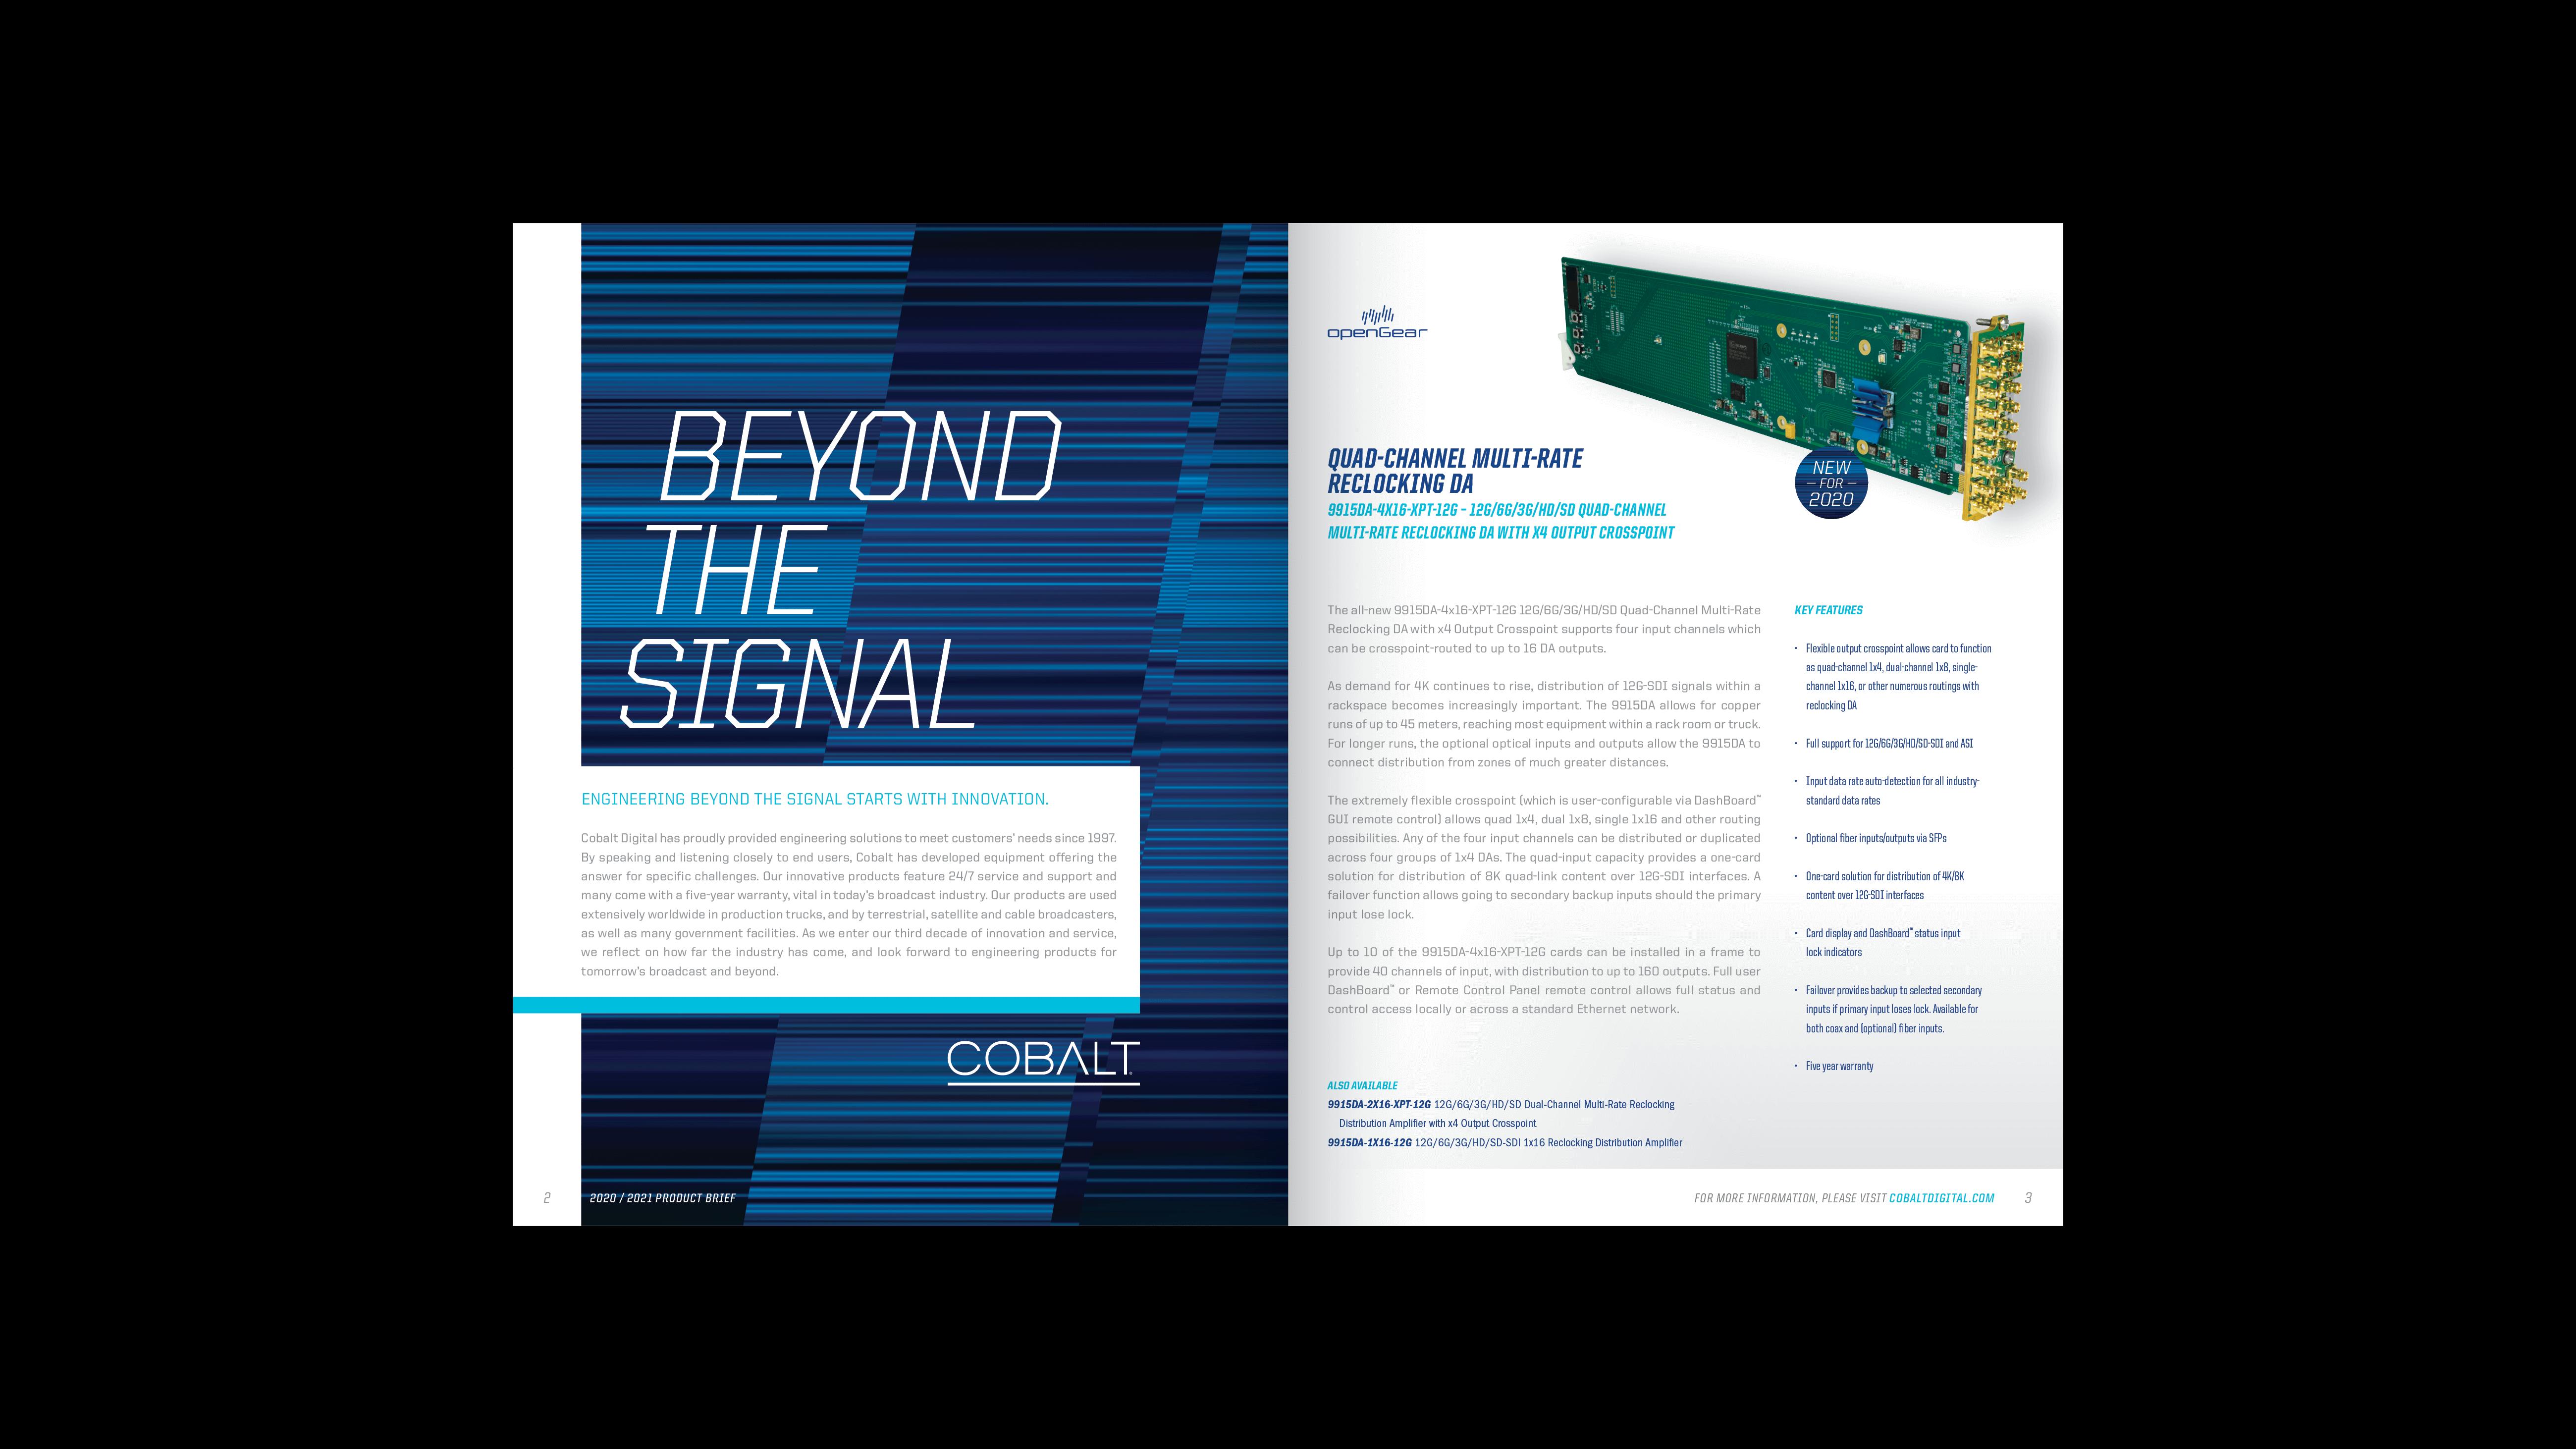 Cobalt Digital | 2020-2021 Product Brief